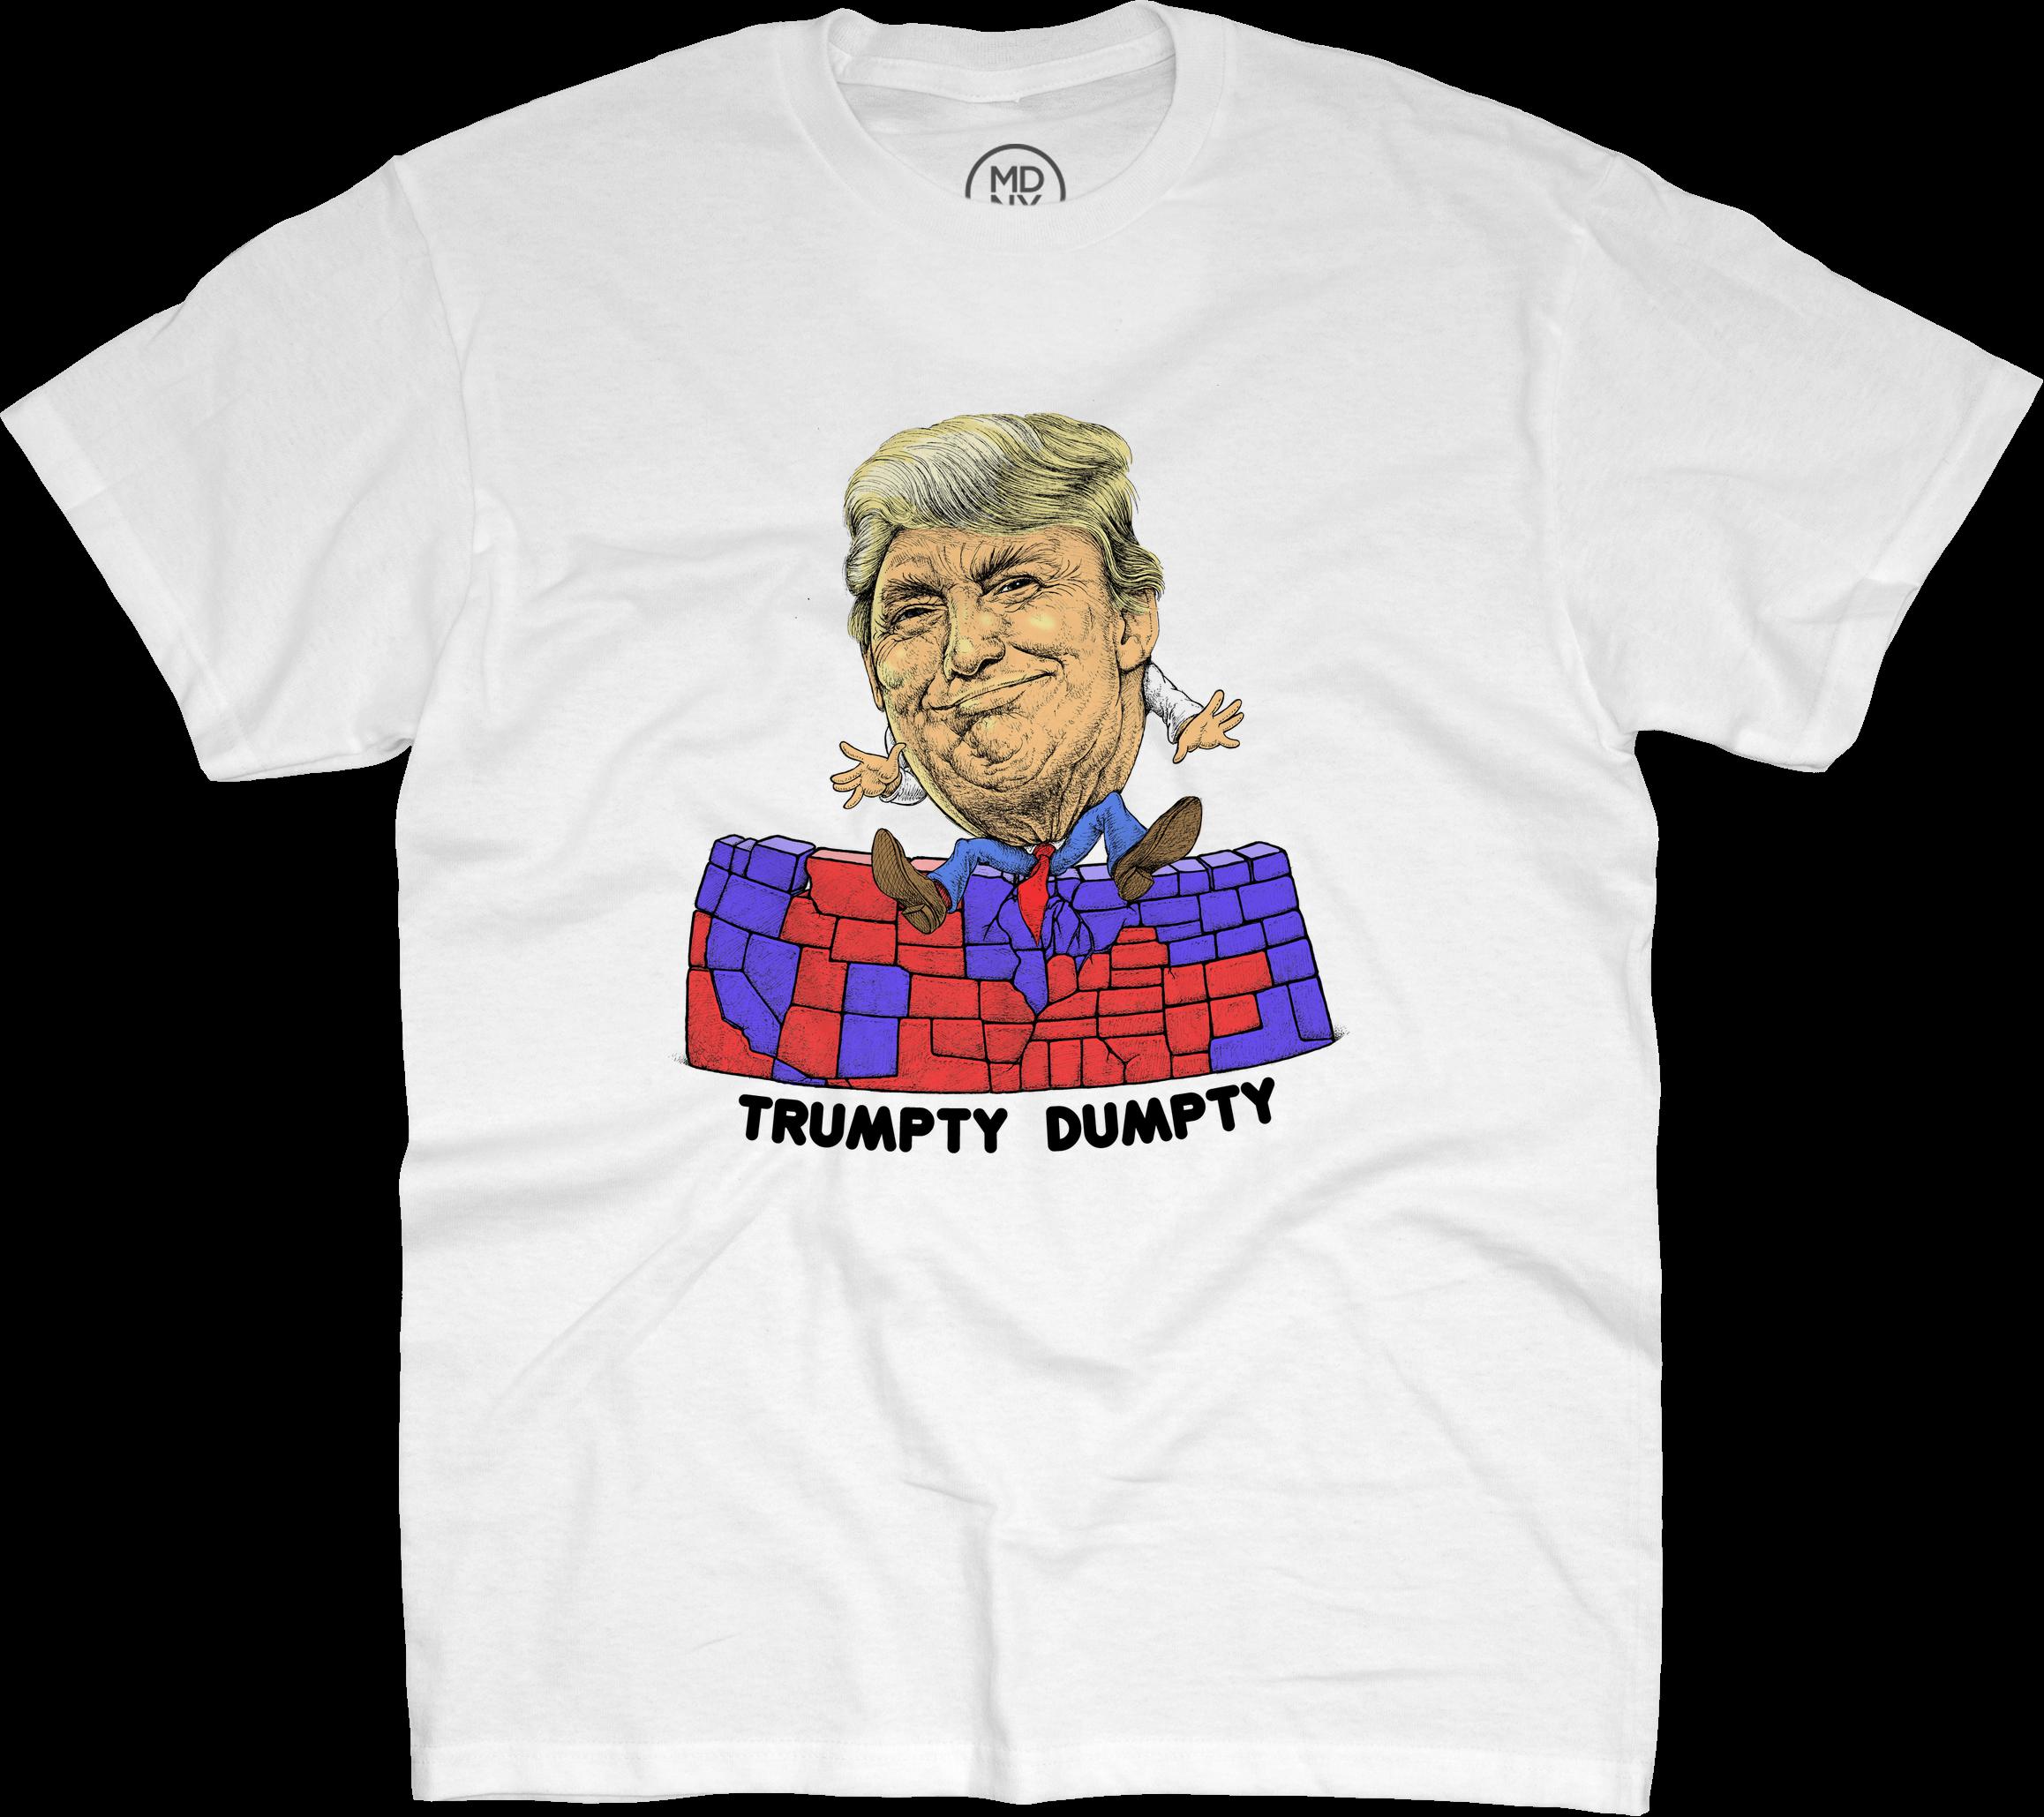 Popaganda Trumpty Dumpty White T Shirt Clash Of The Clans